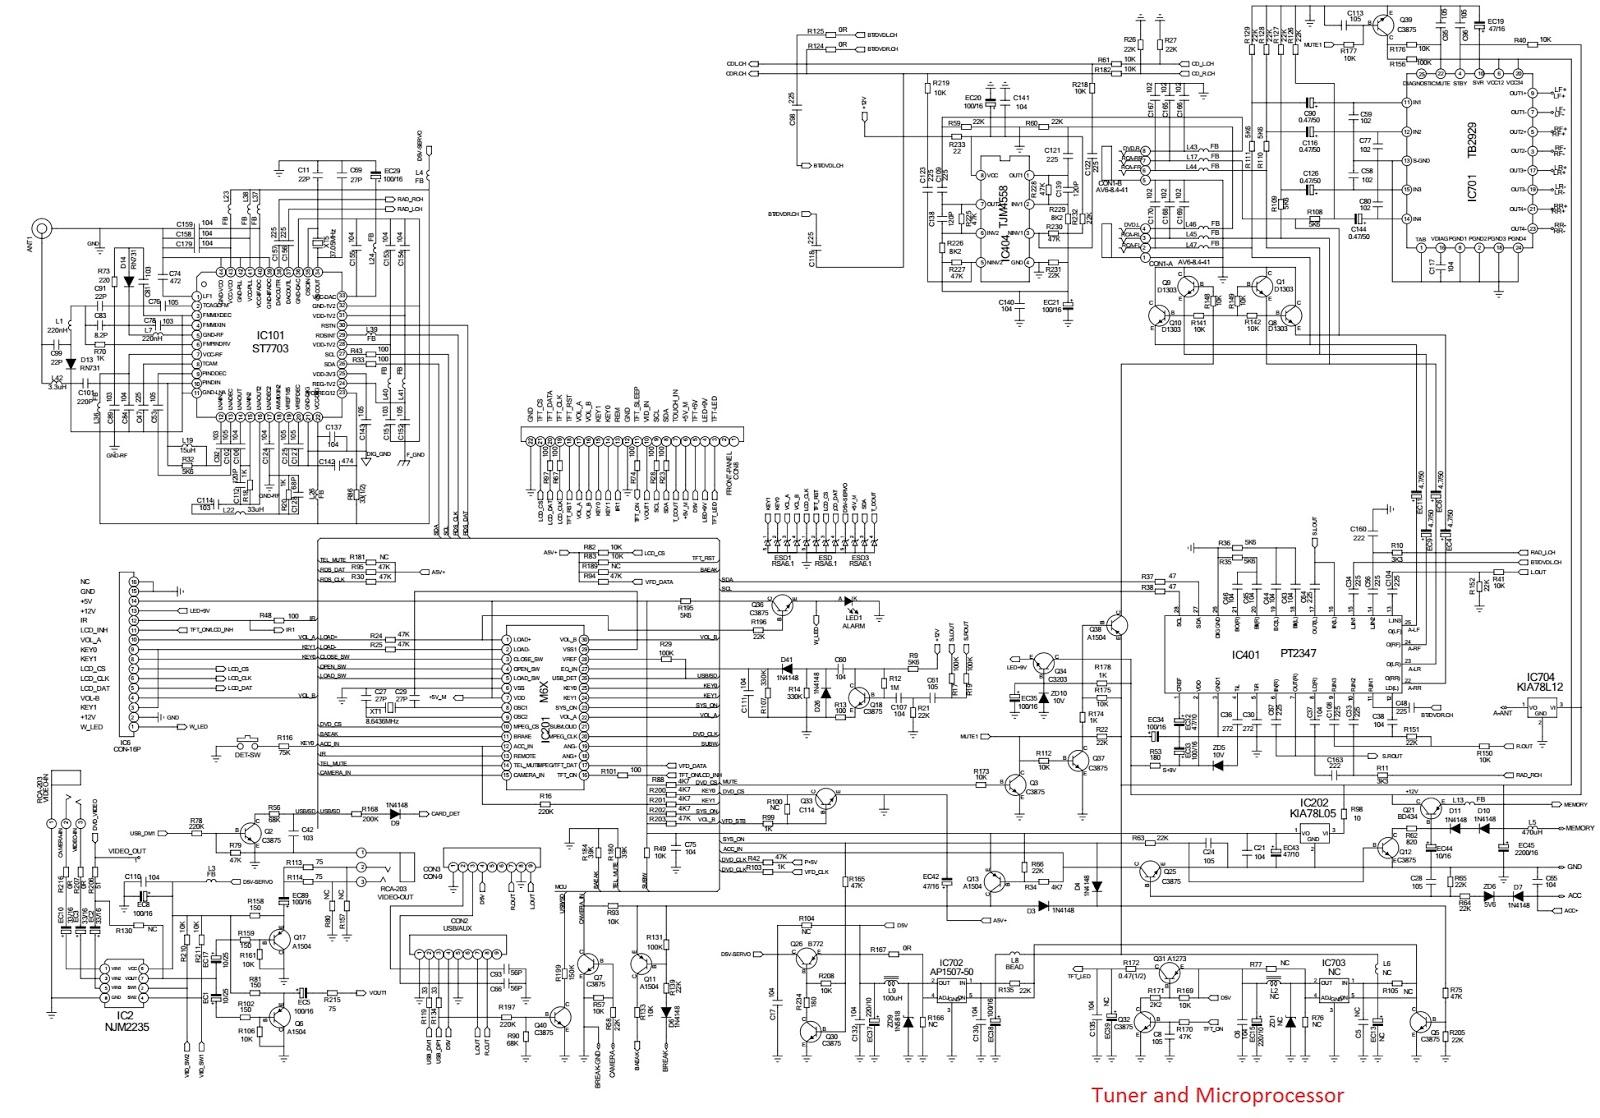 Electro Help Philco Pca 530 Auto Radio Schematic Diagram